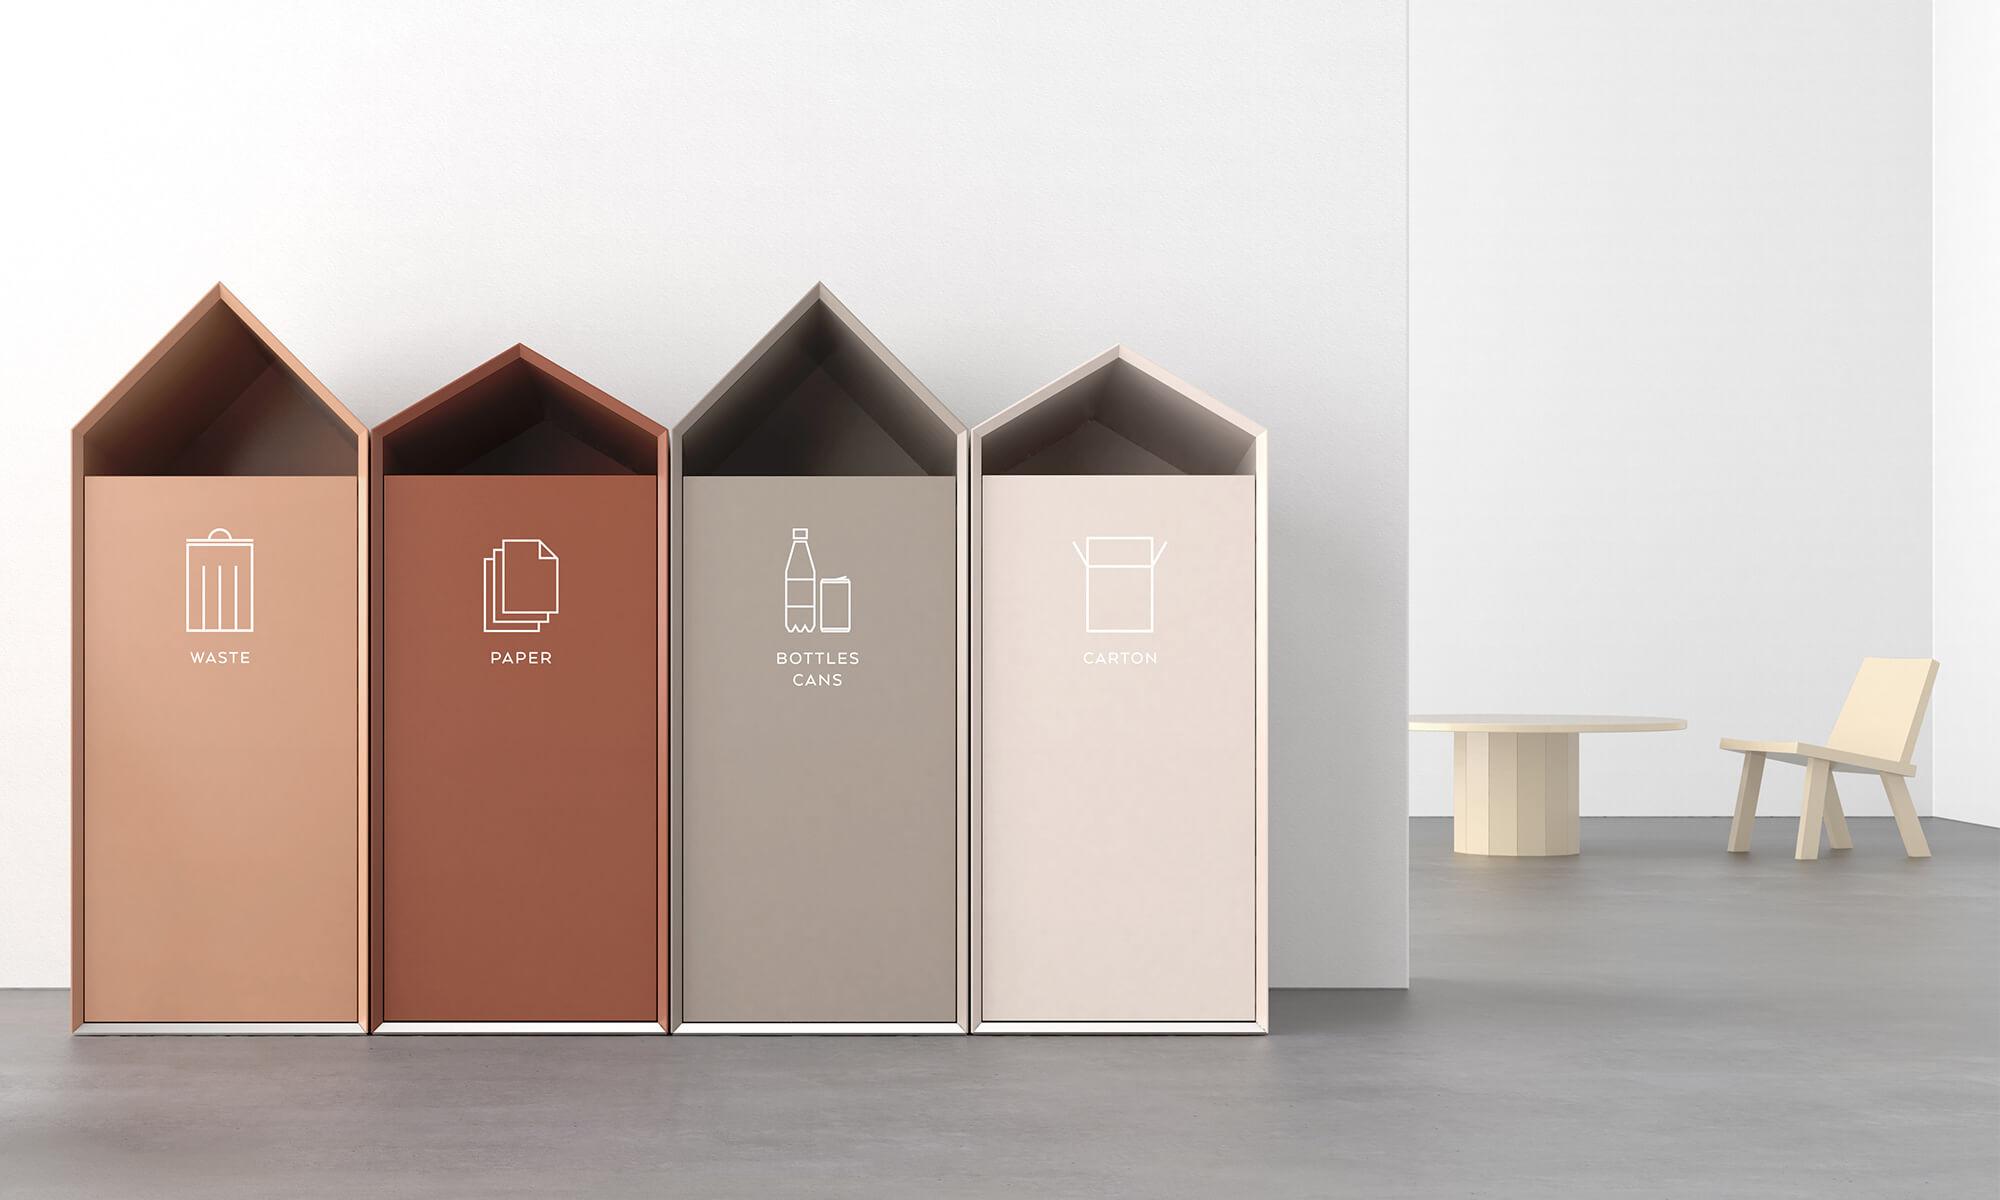 Ridge trece källsortering recycling bin studio doms papperskorg kontor